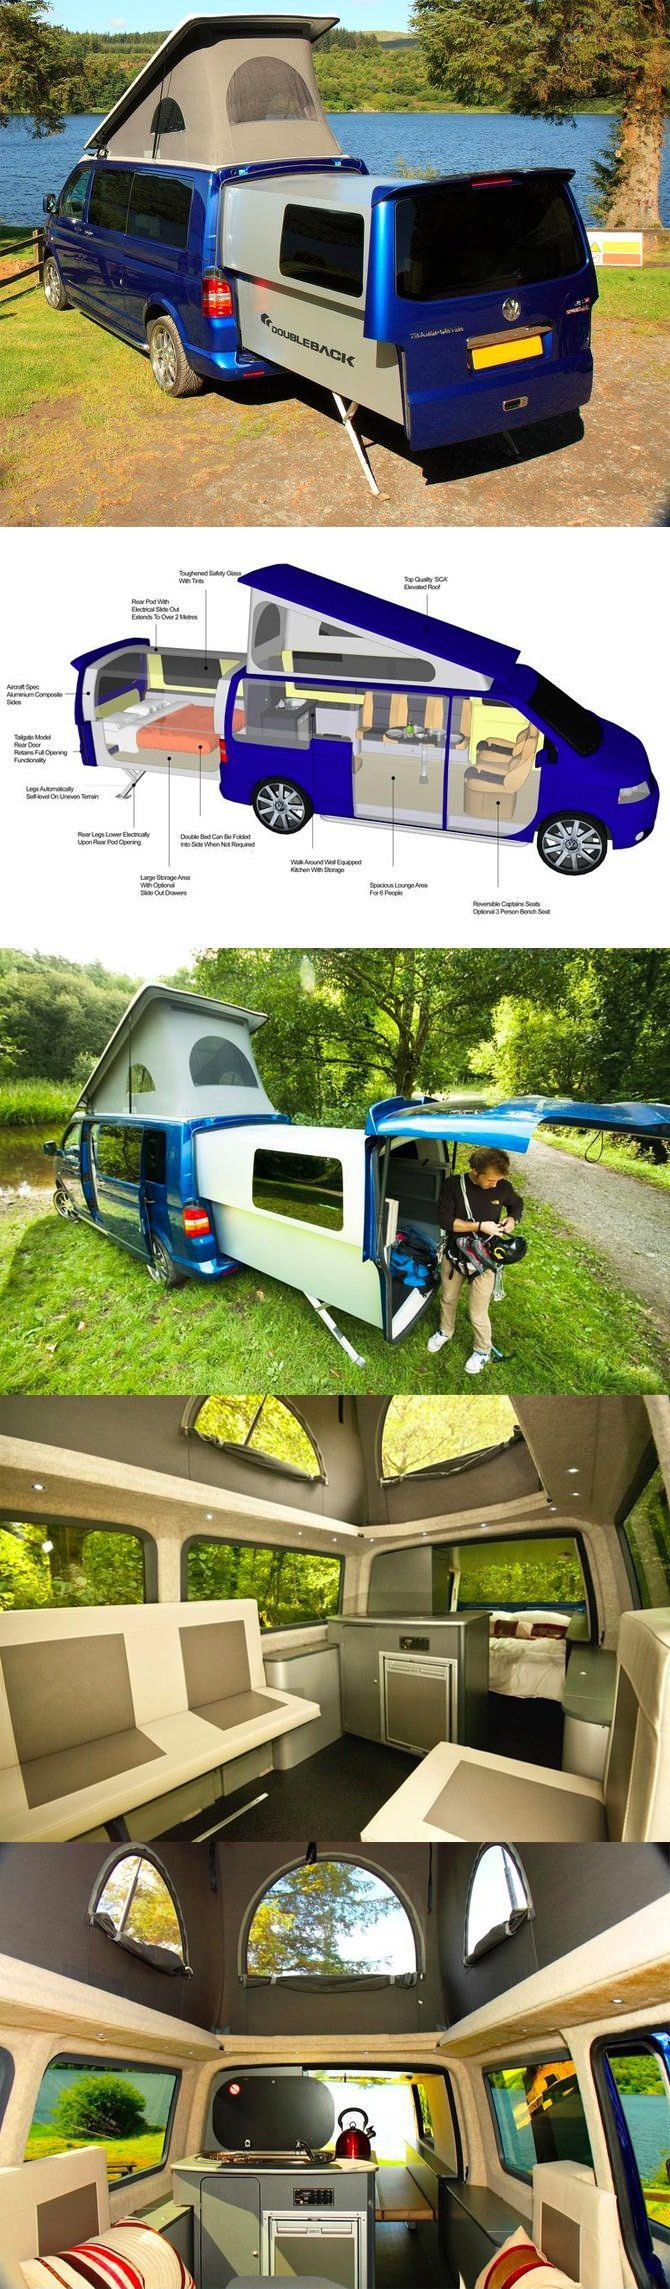 25 Coachella Festival Car Camping #wohnwagen